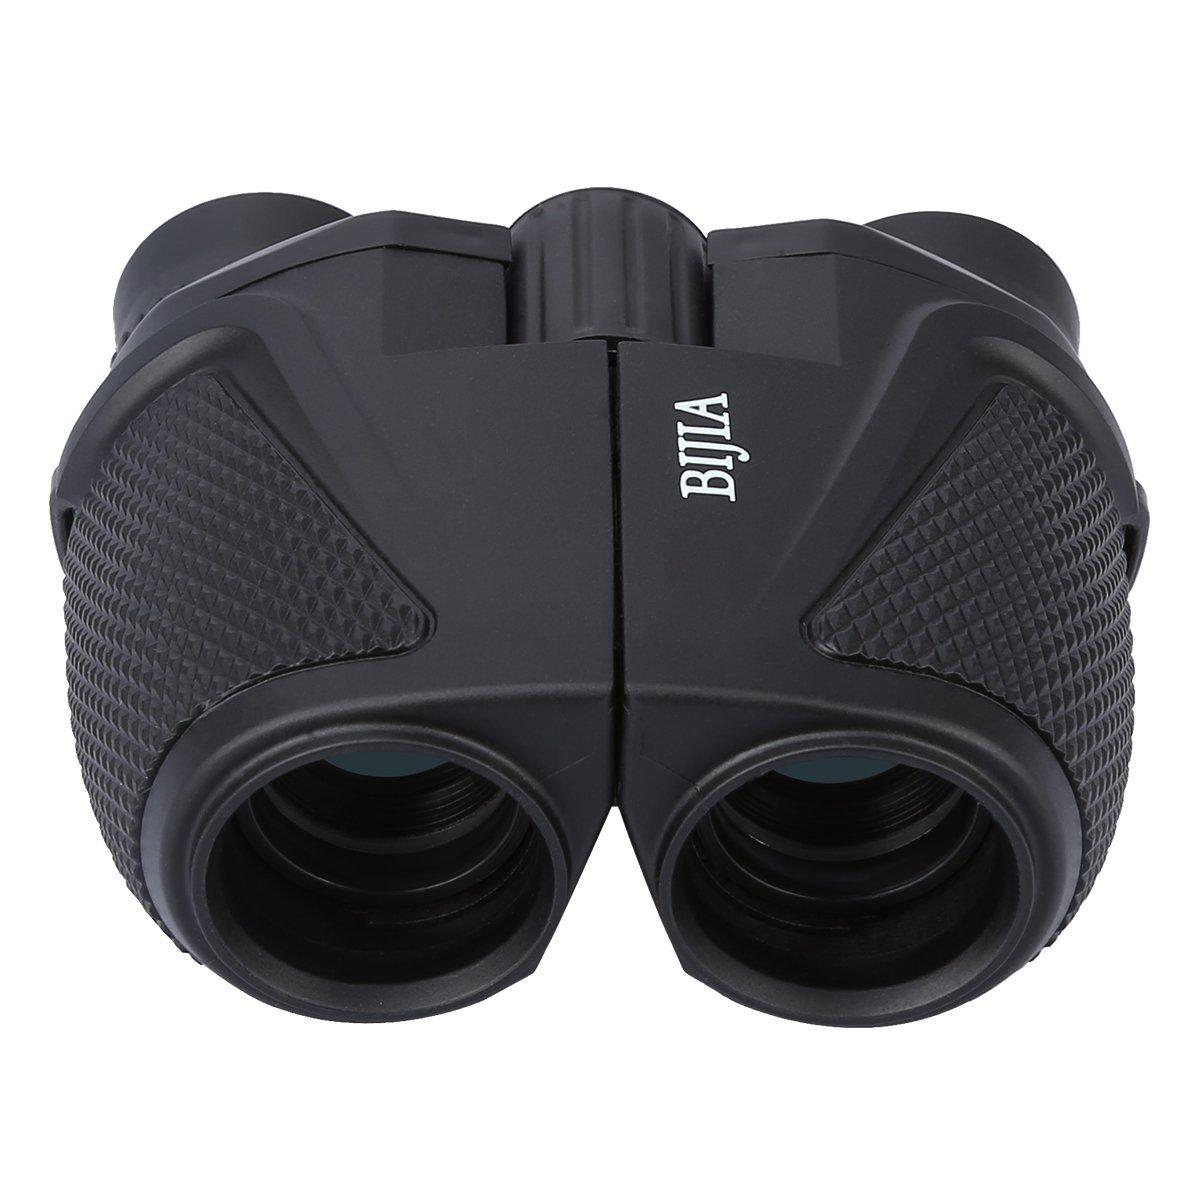 12x25 Compact Binoculars, BAK4,Green Lens $20.99 @ Amazon